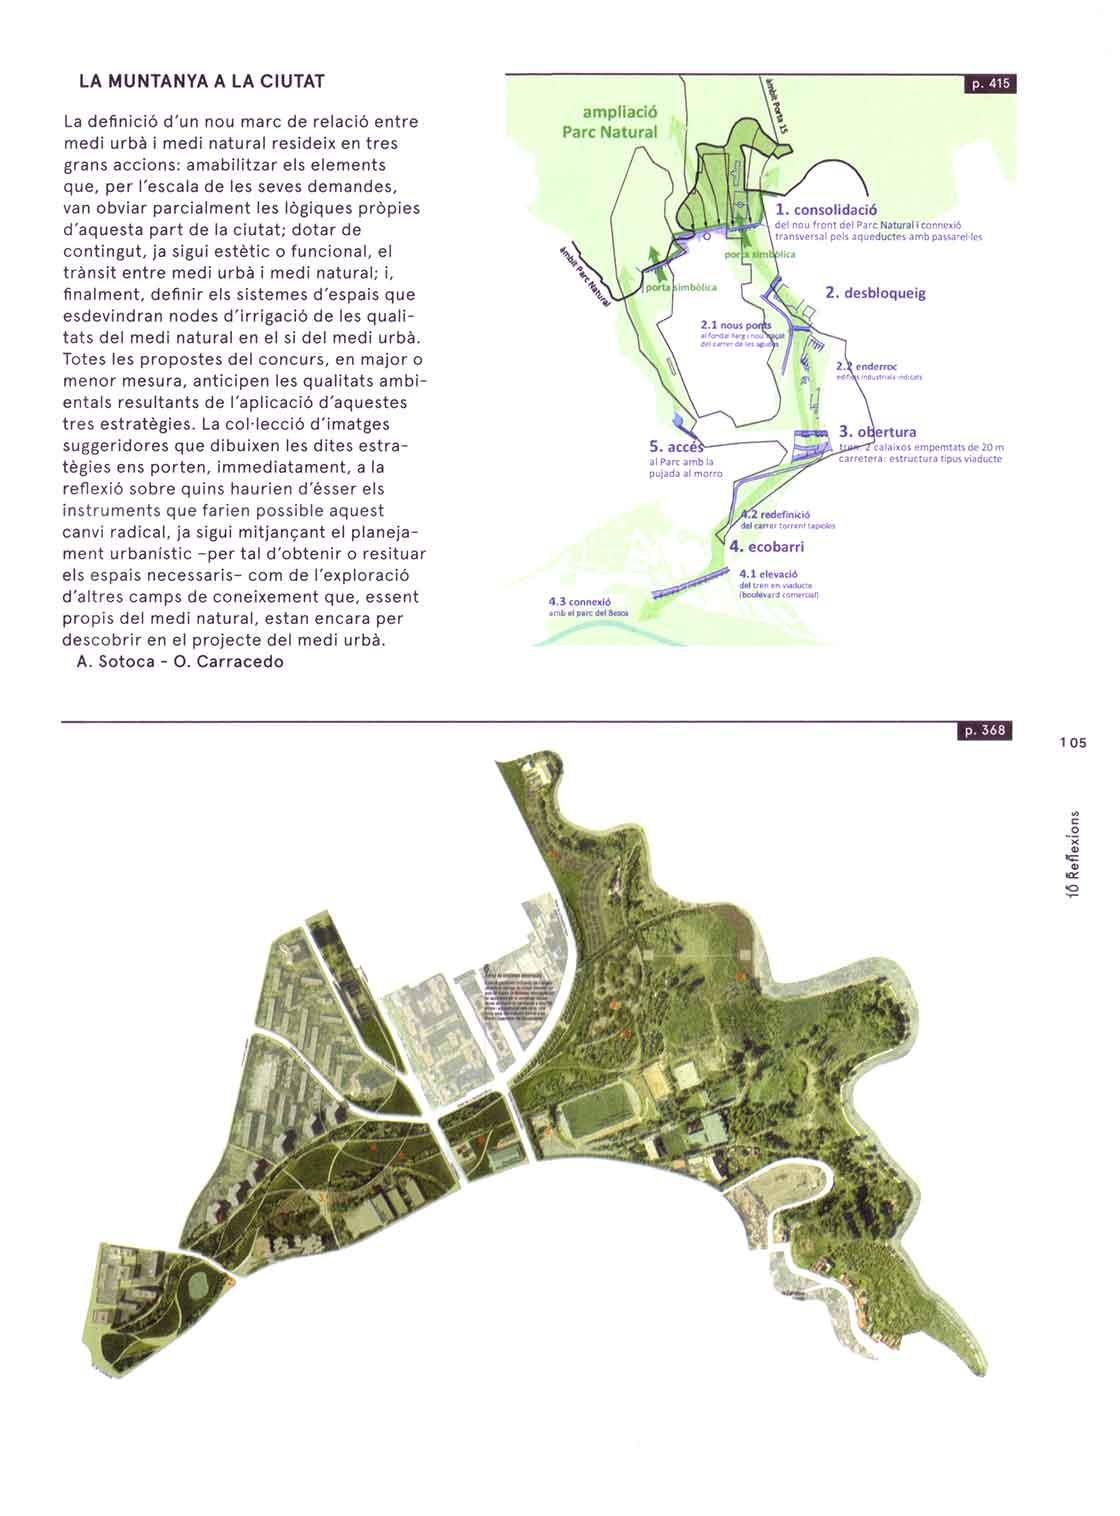 Naturbà - página 105 @Marc García-Durán, arquitecto